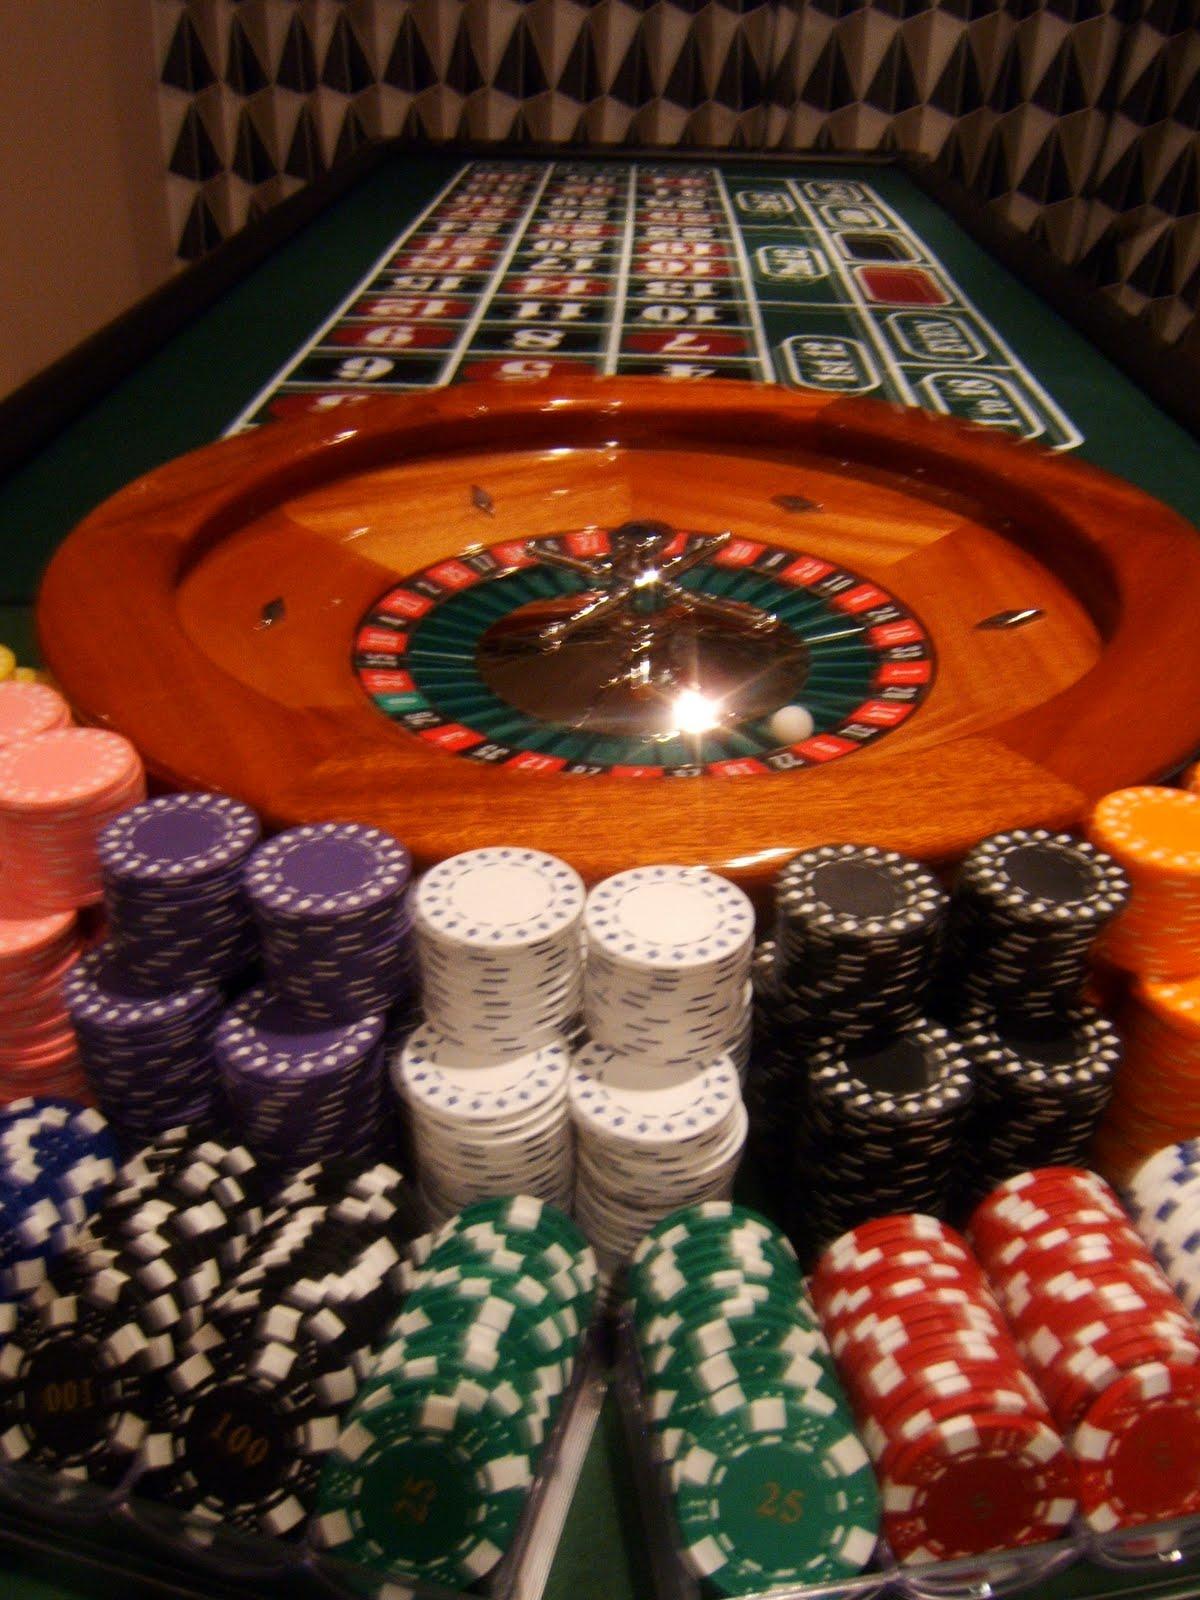 Casino clipart gambling. Clip art